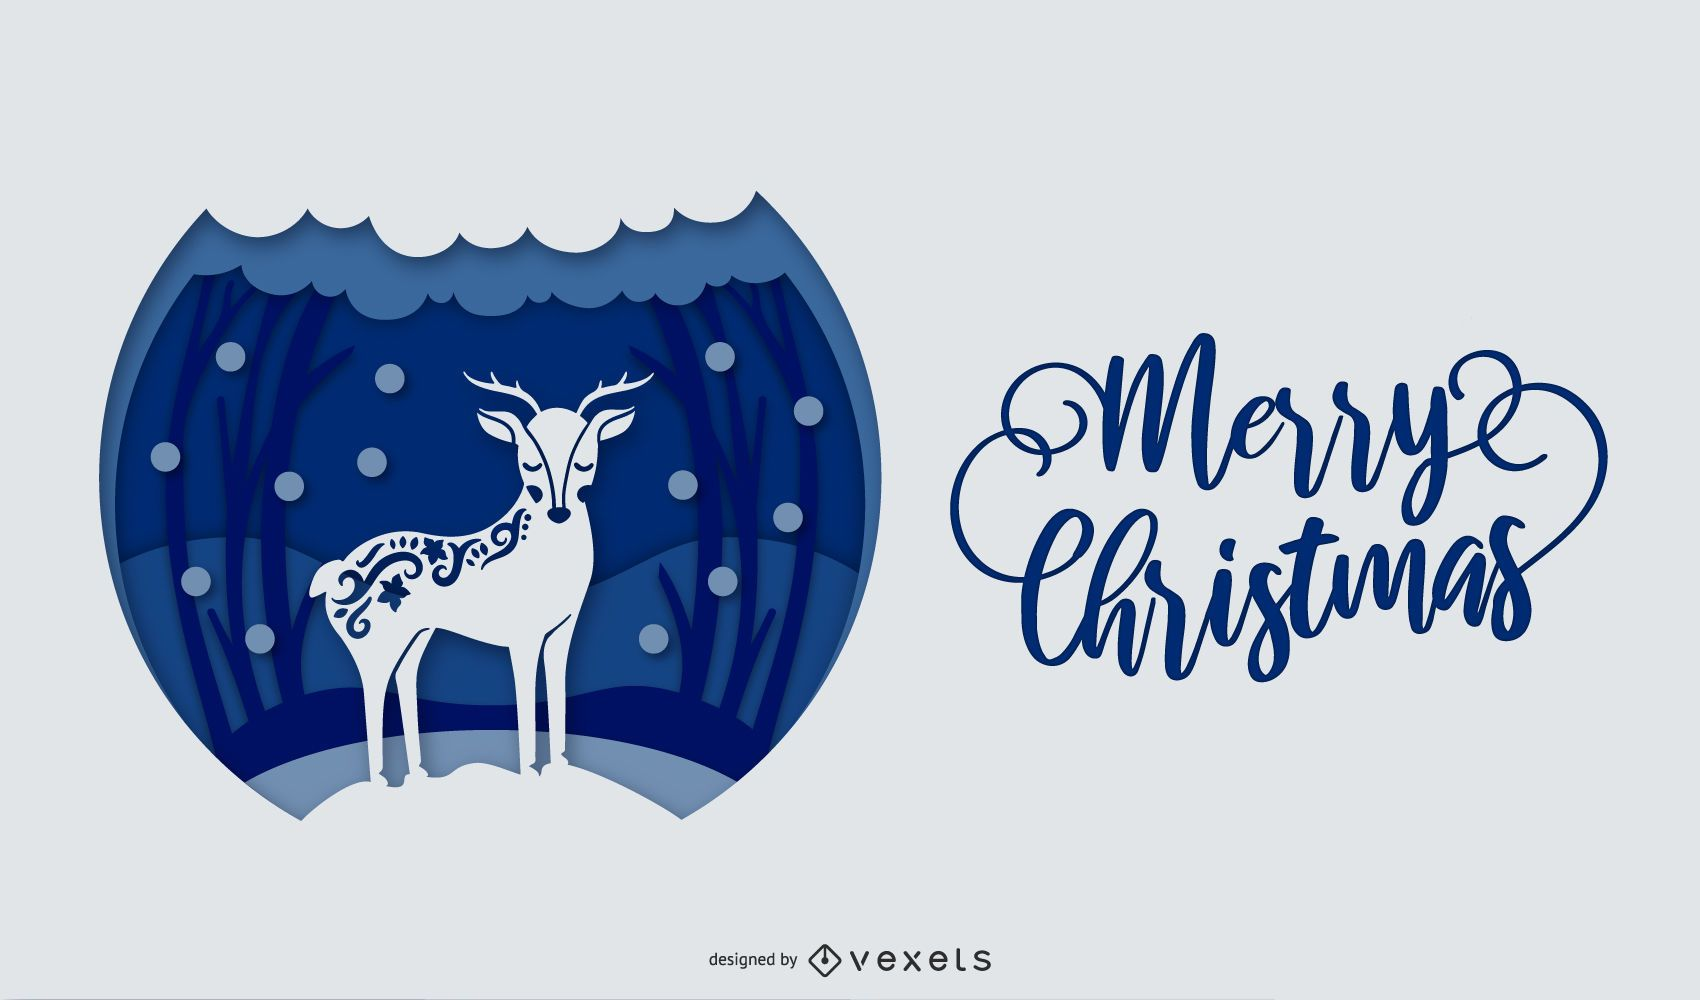 Merry christmas papercut illustration